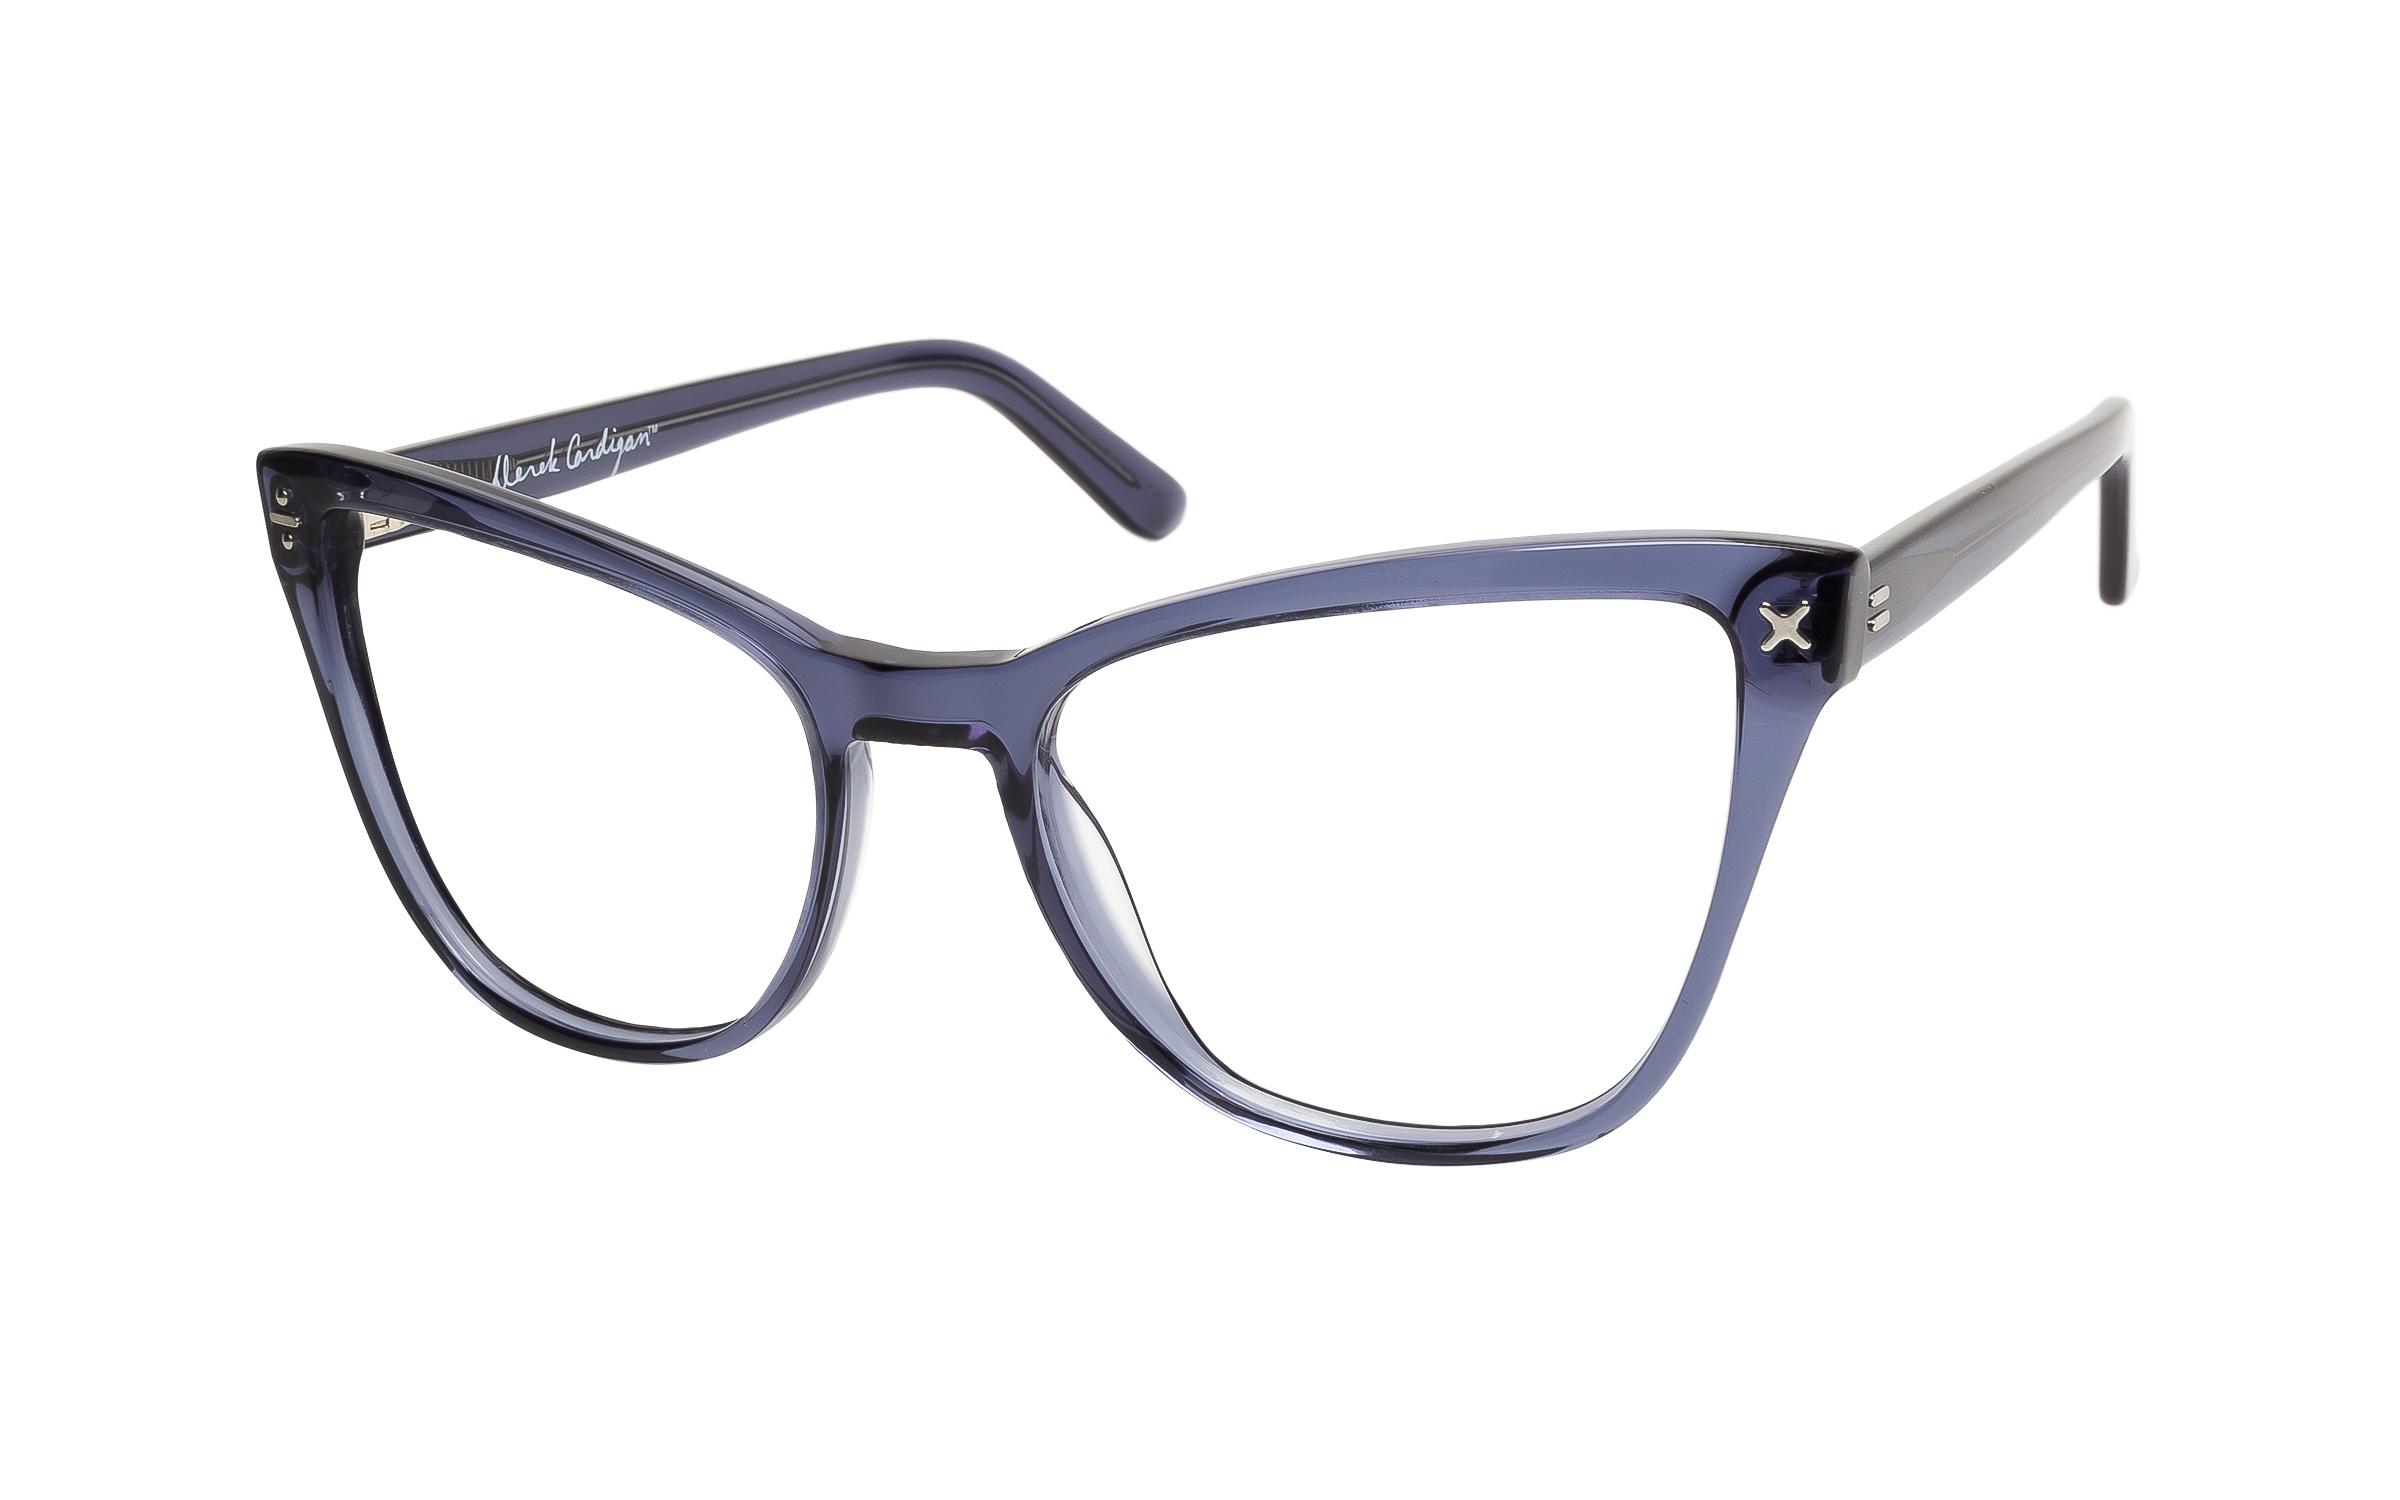 Women's Vintage Glasses Blue/Clear Derek Cardigan Online Clearly